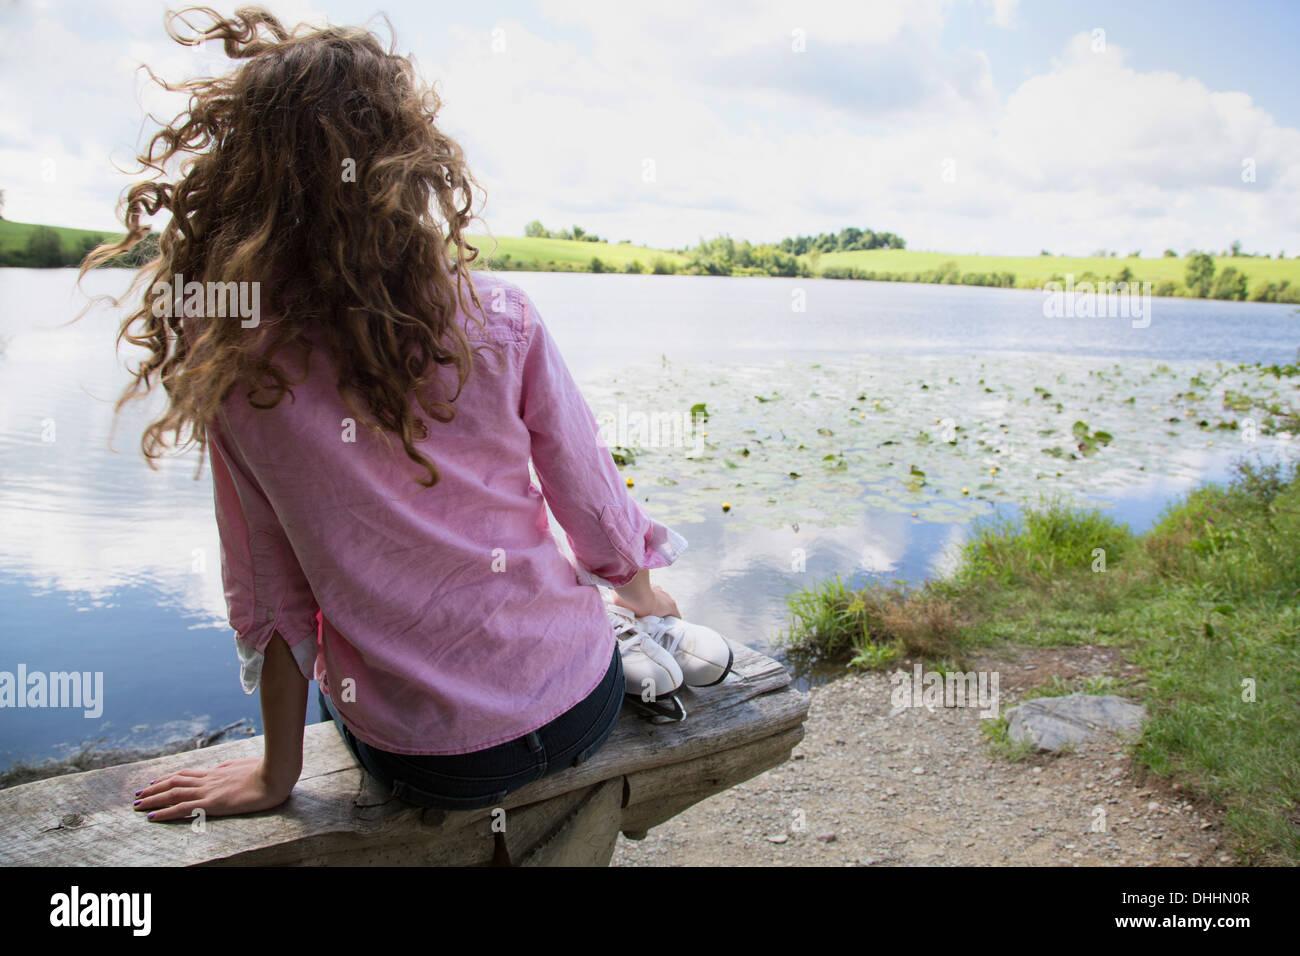 Teenage girl sitting on bench with ice skates - Stock Image